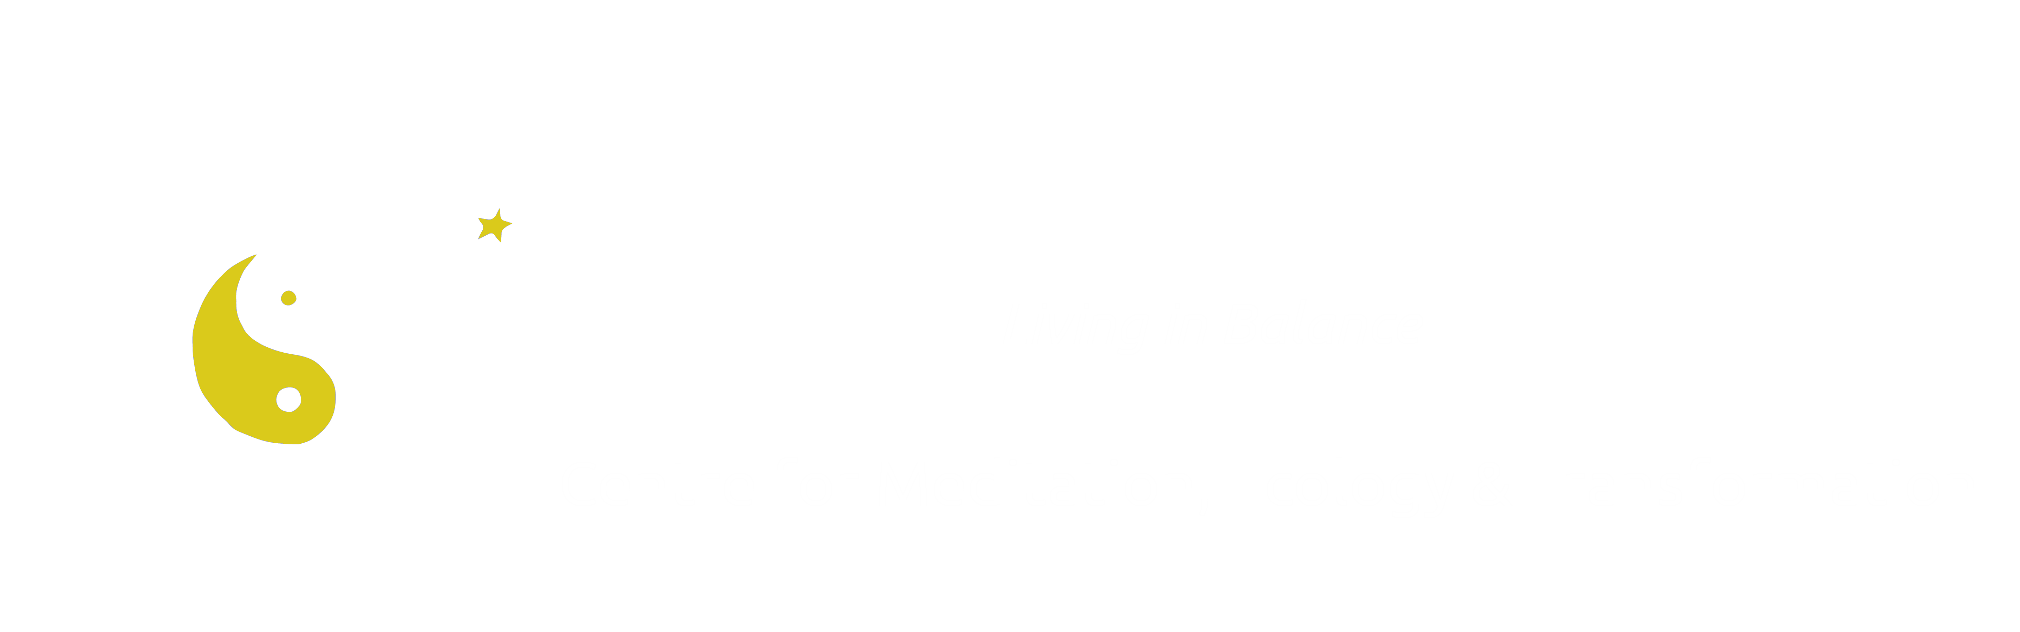 Monte da Vida